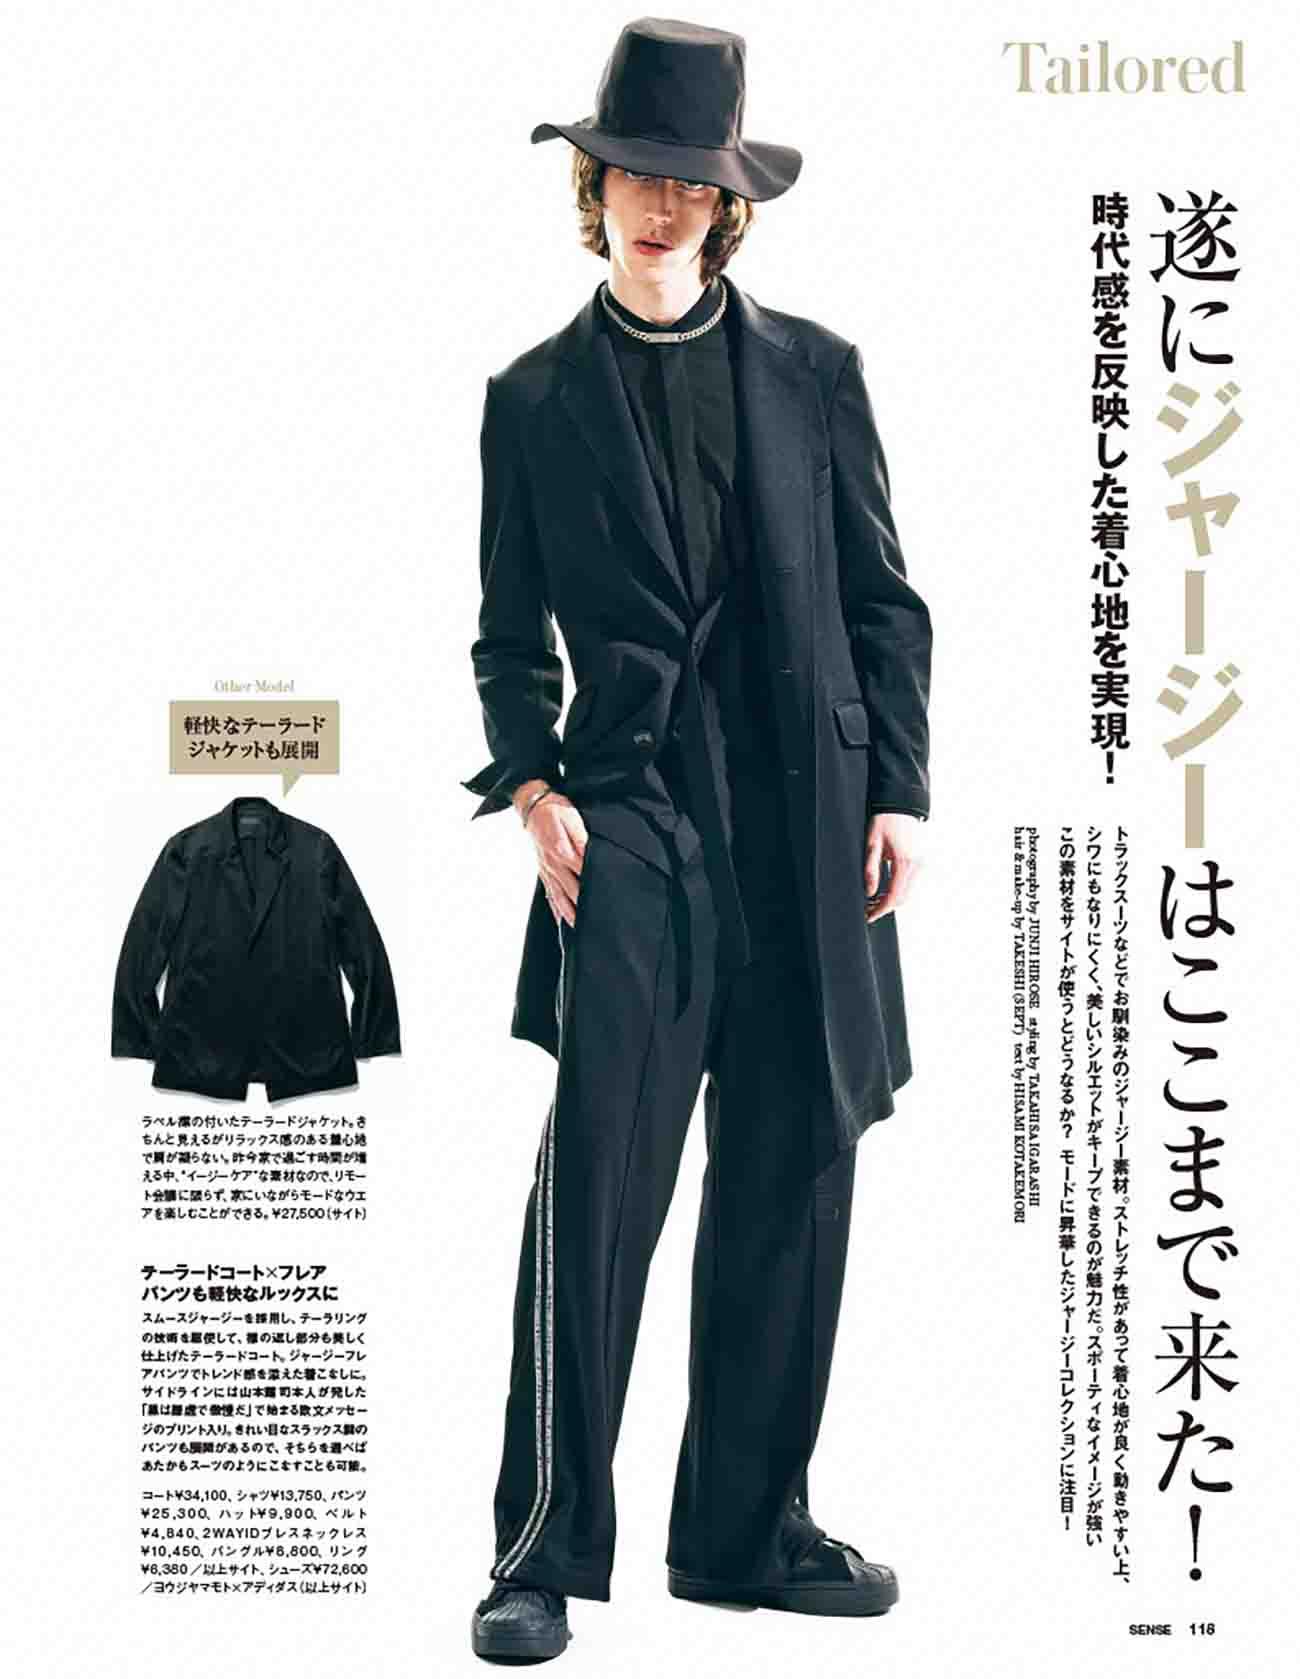 Pe/Smooth Jersey 3BS Slim Long Jacket